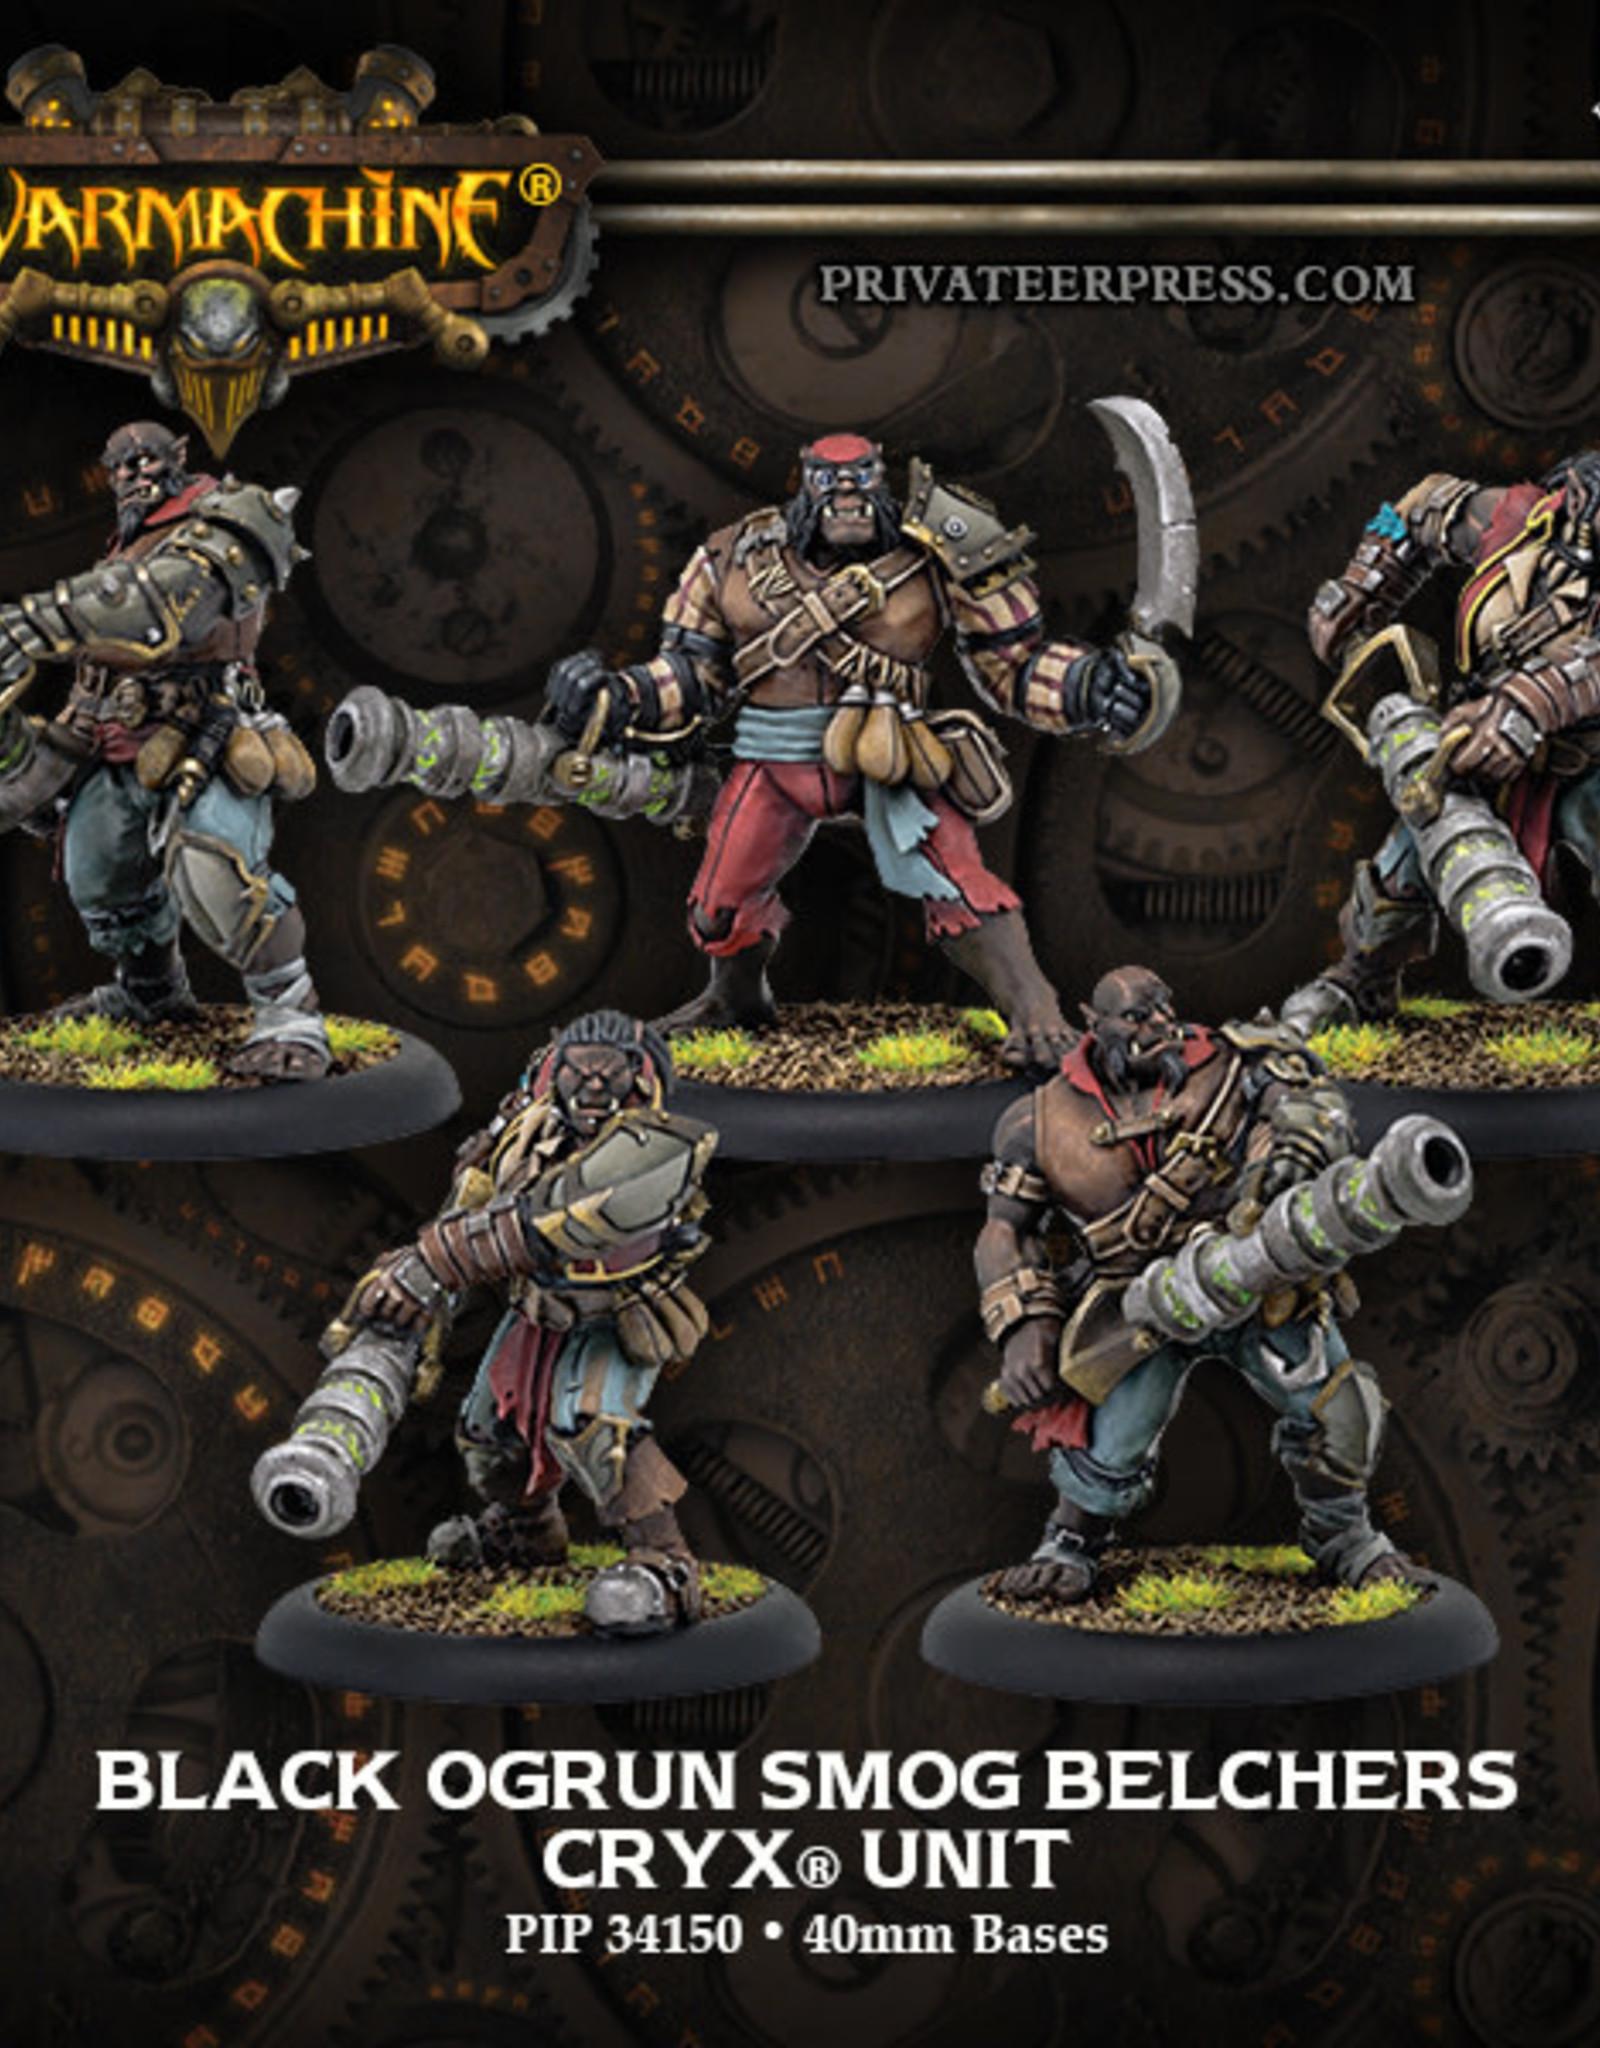 Warmachine Cryx - Black Ogrun Smog Belcher